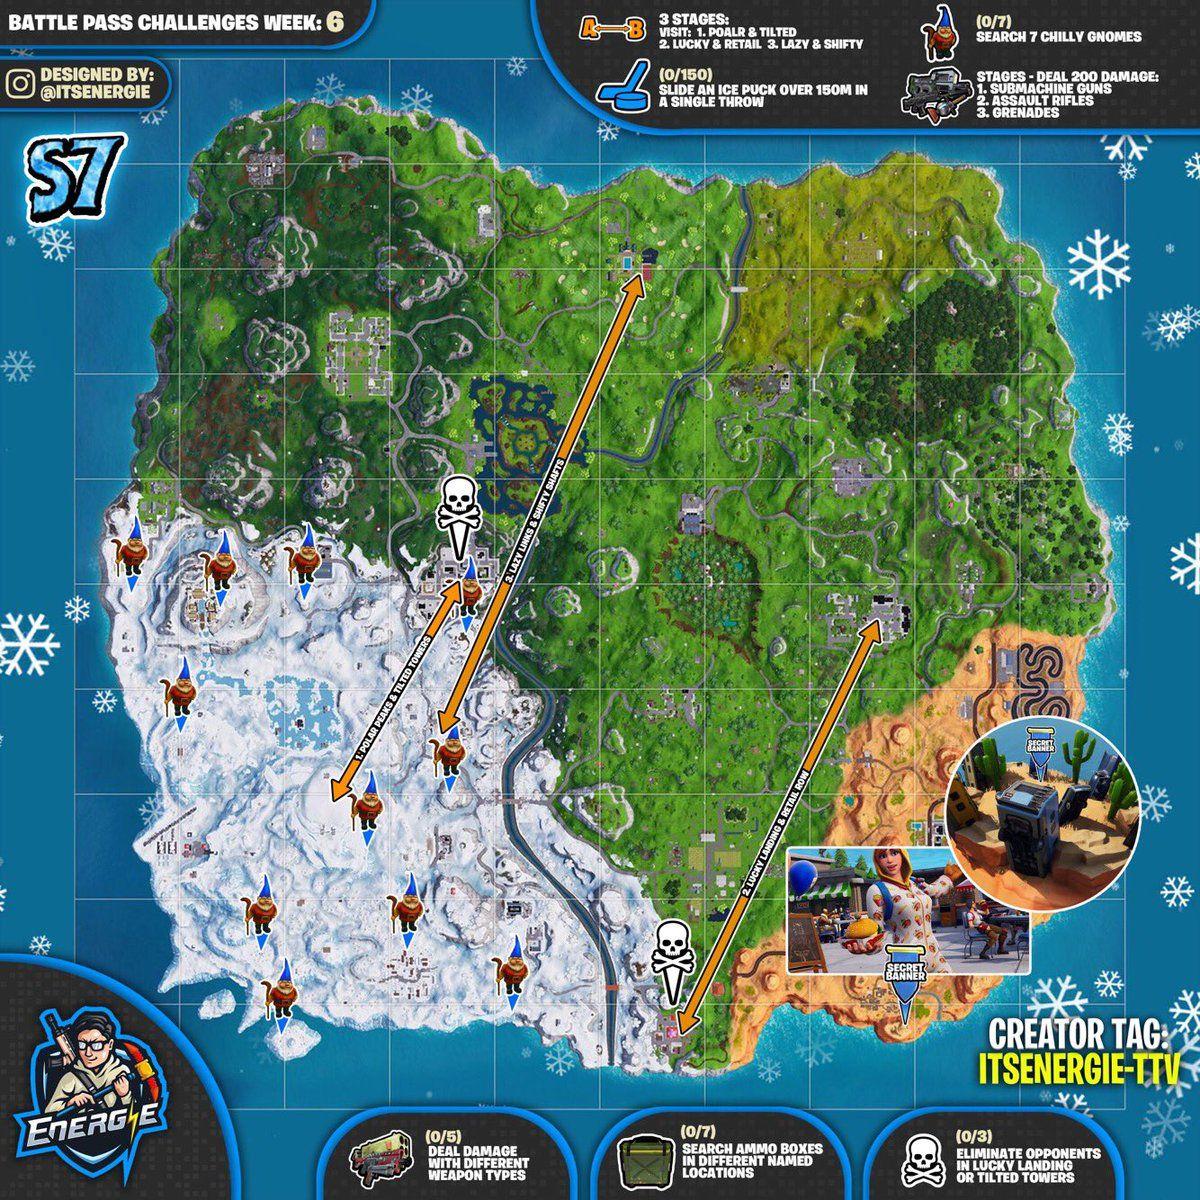 fortnite cheat sheet map for season 7 week 6 challenges fortnite fortnitebattleroyale game - fortnite season 7 cheat map